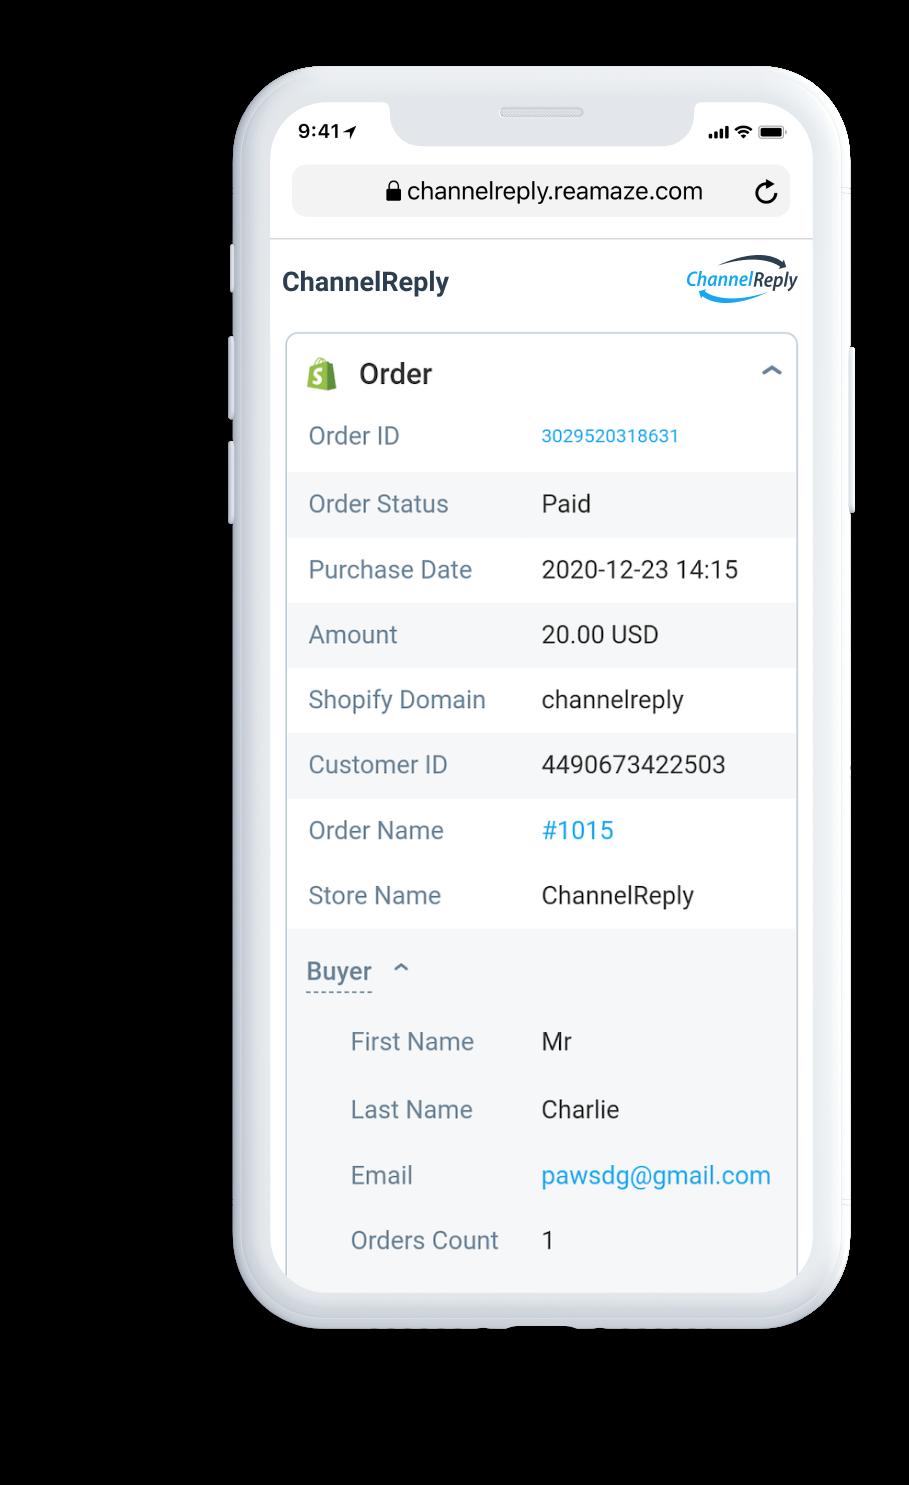 Amazon Data in the Re:amaze Mobile App